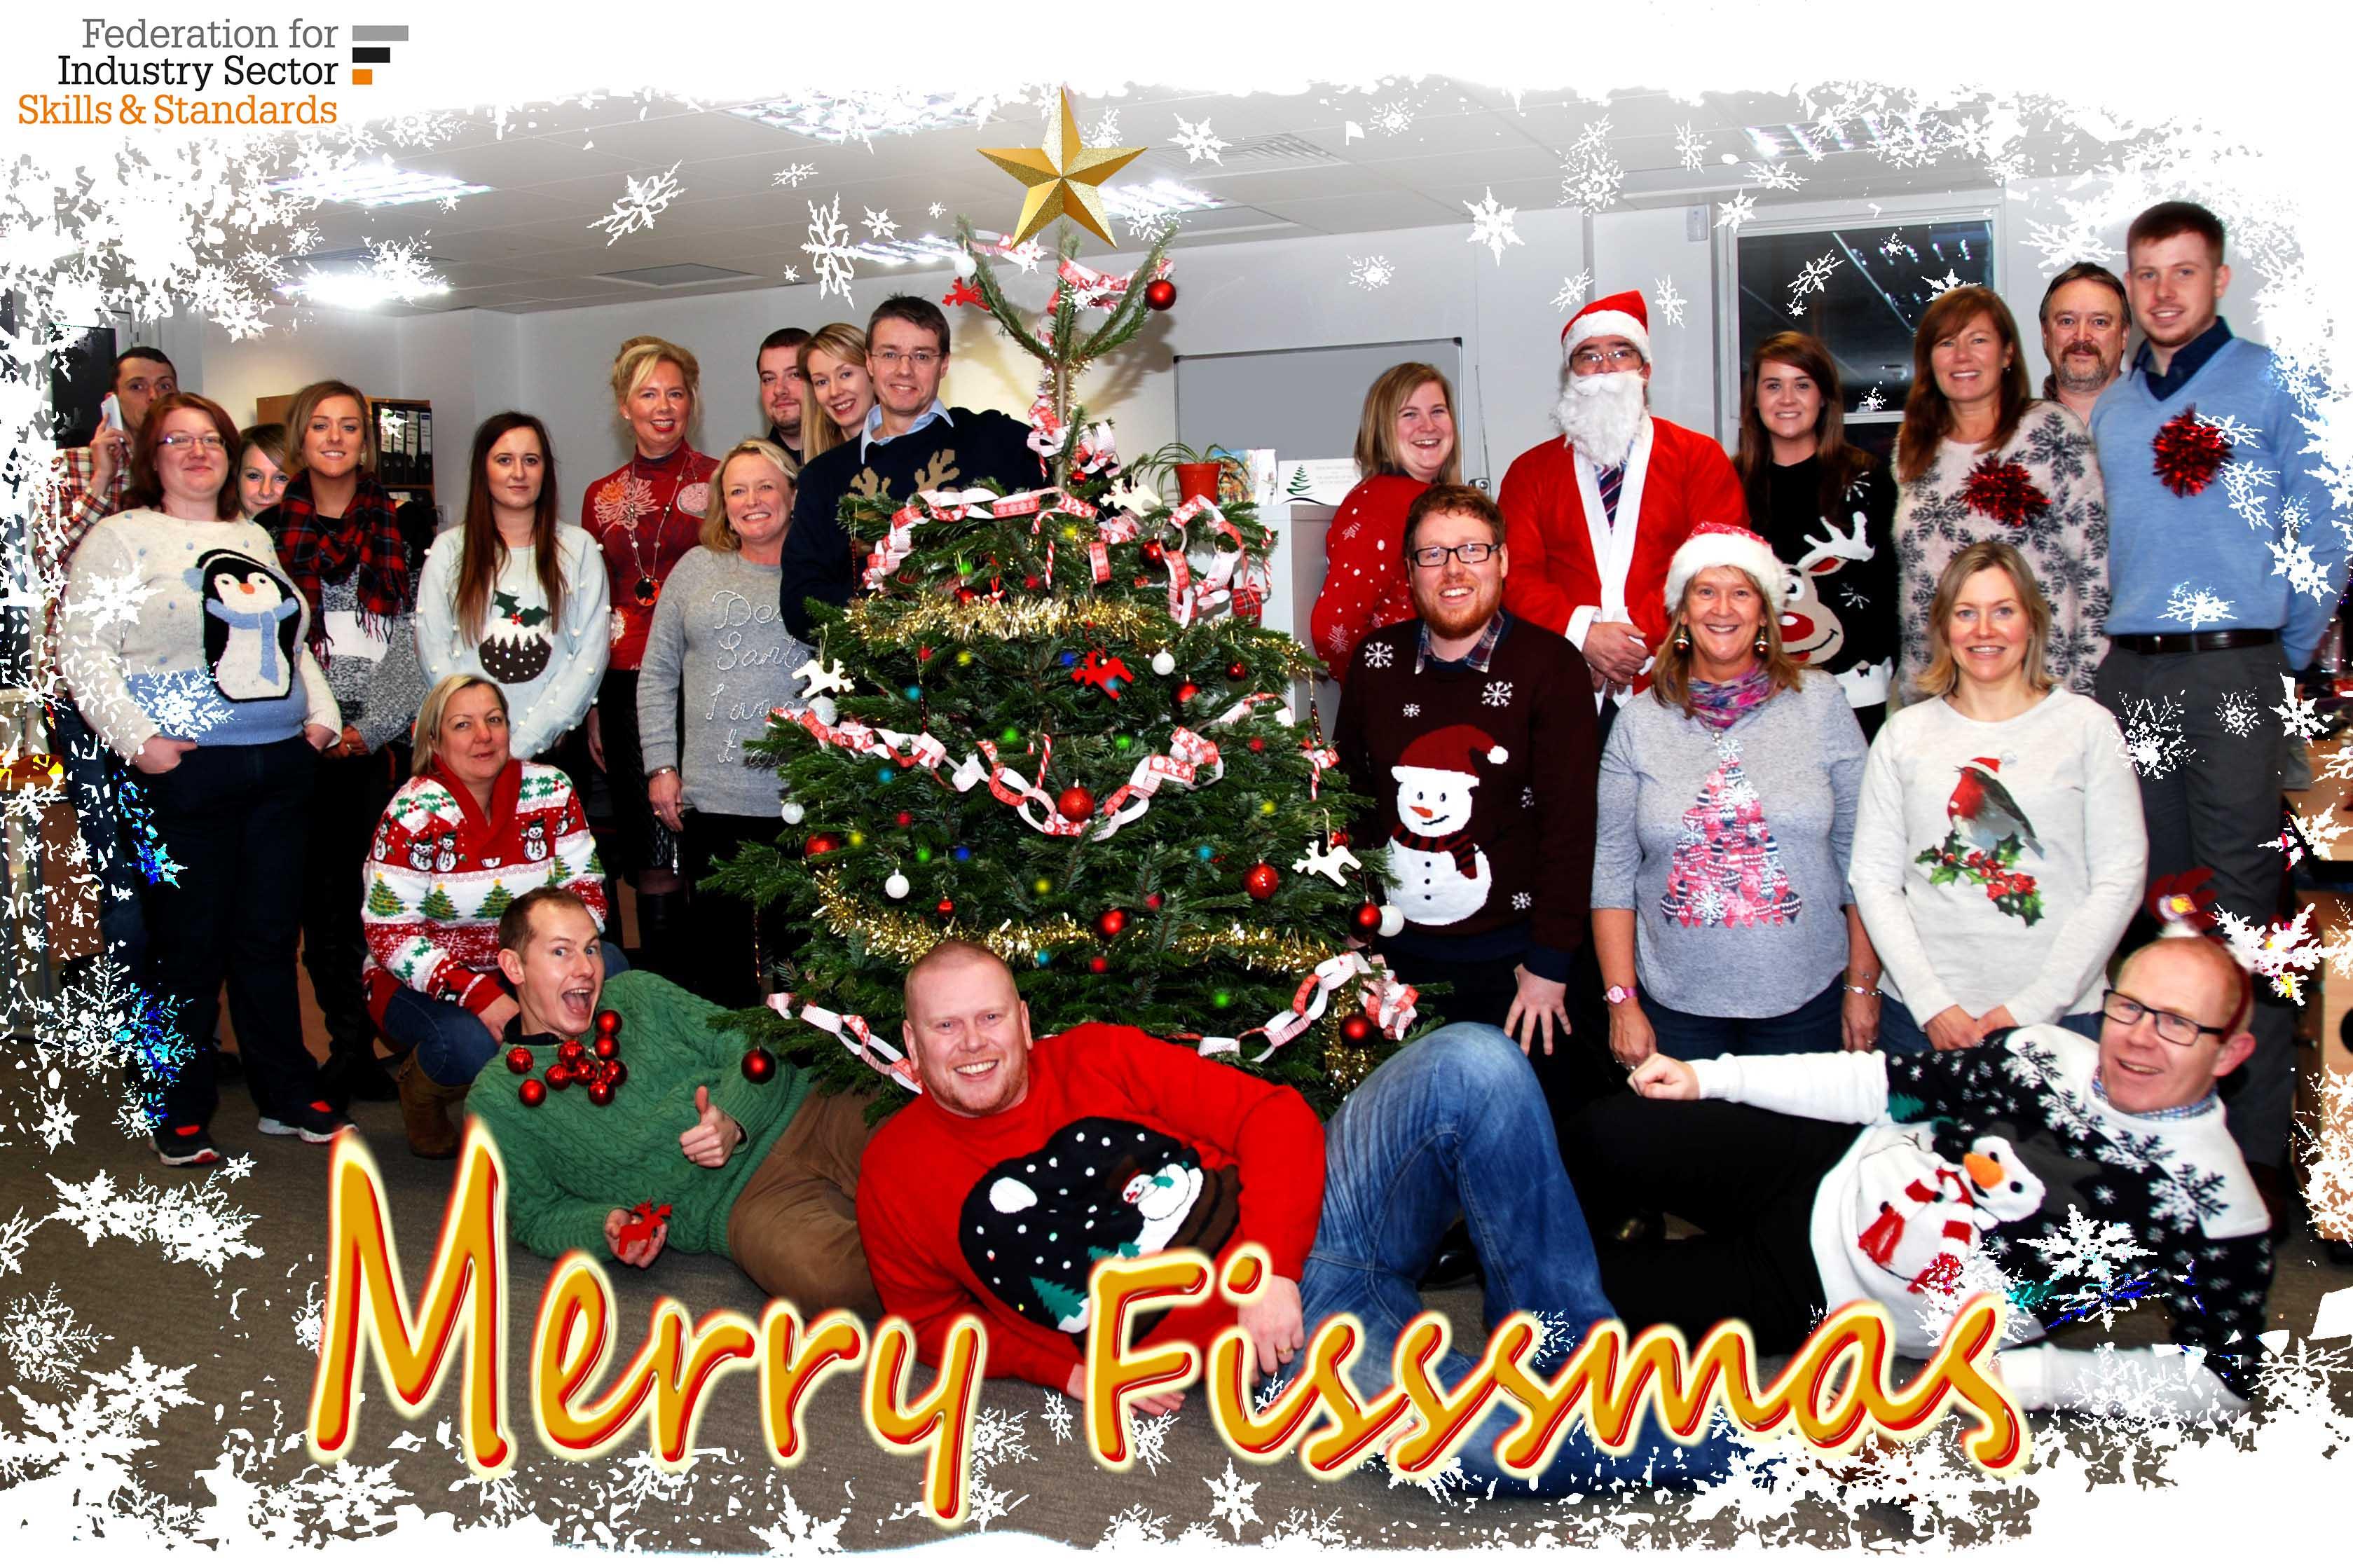 Merry Fisssmas 2014